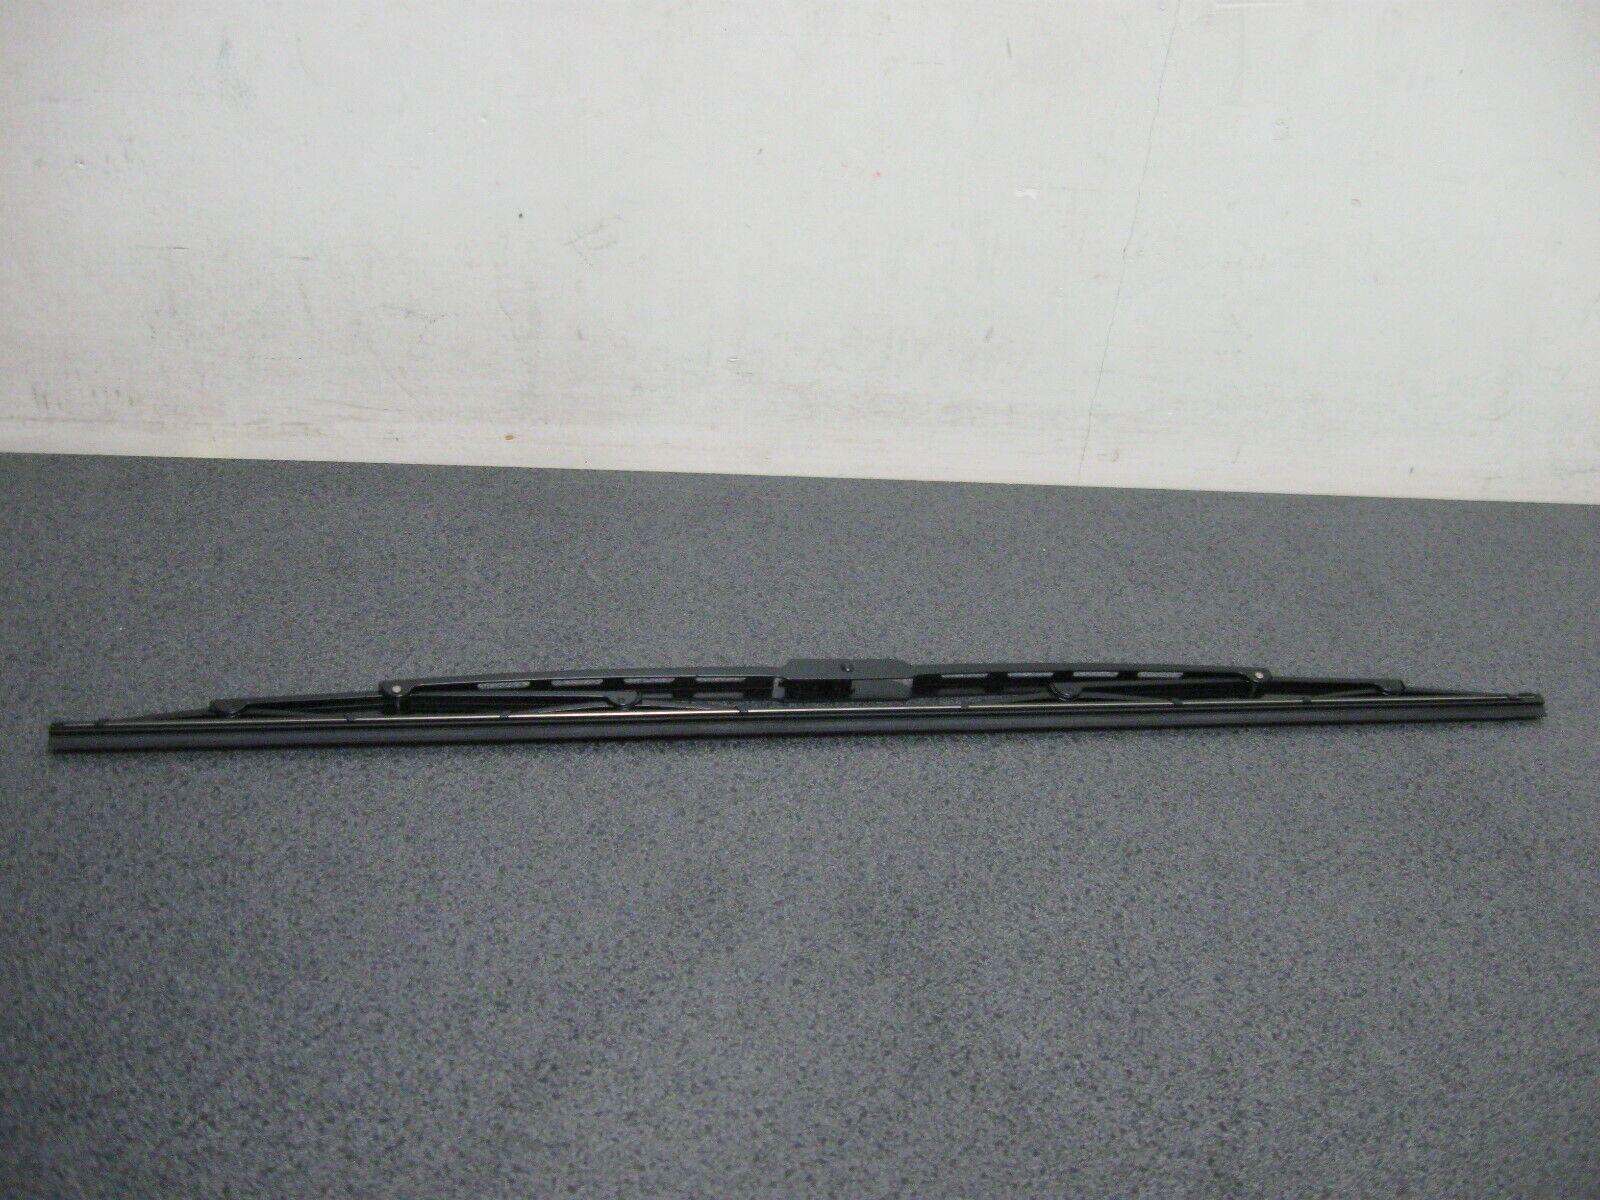 Genuine Toyota Wiper Black Hook Type 650mm or 25 1//2 in  QTY=1 85222-YZZ18-TM